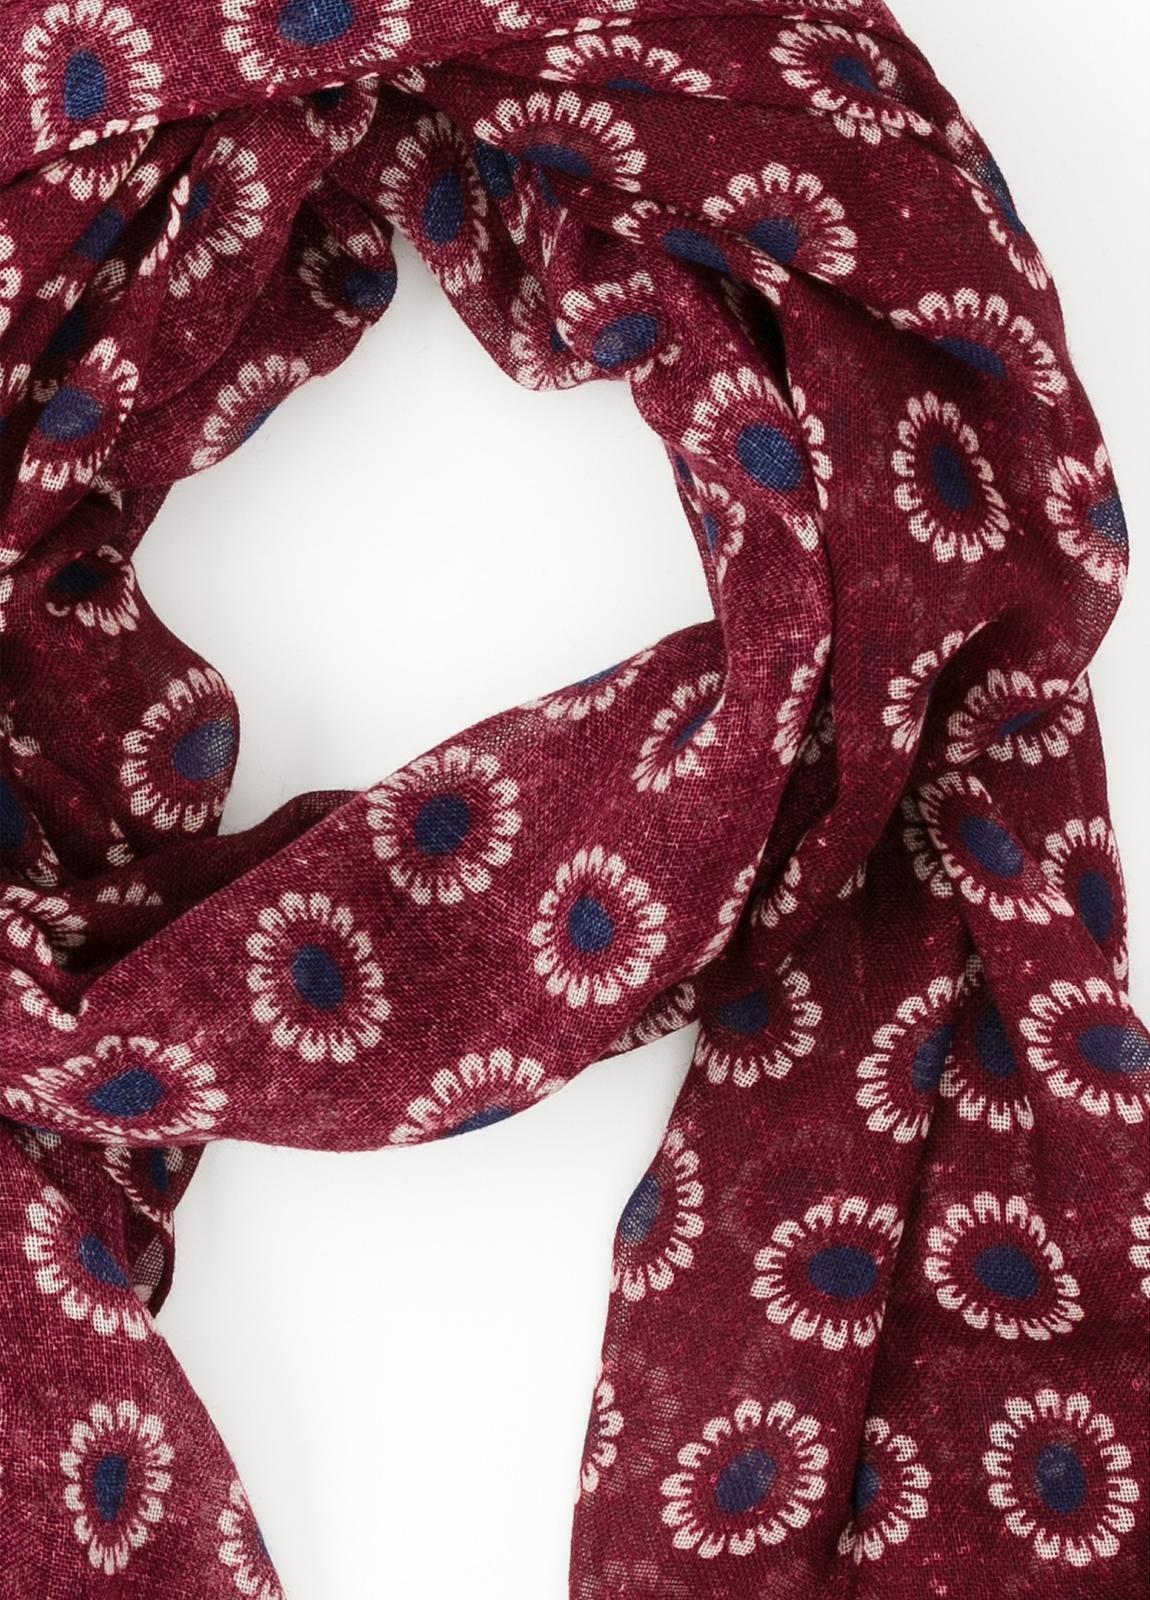 Foulard estampado floral color granate, 70 x 200 cm. 100% Lana. - Ítem1